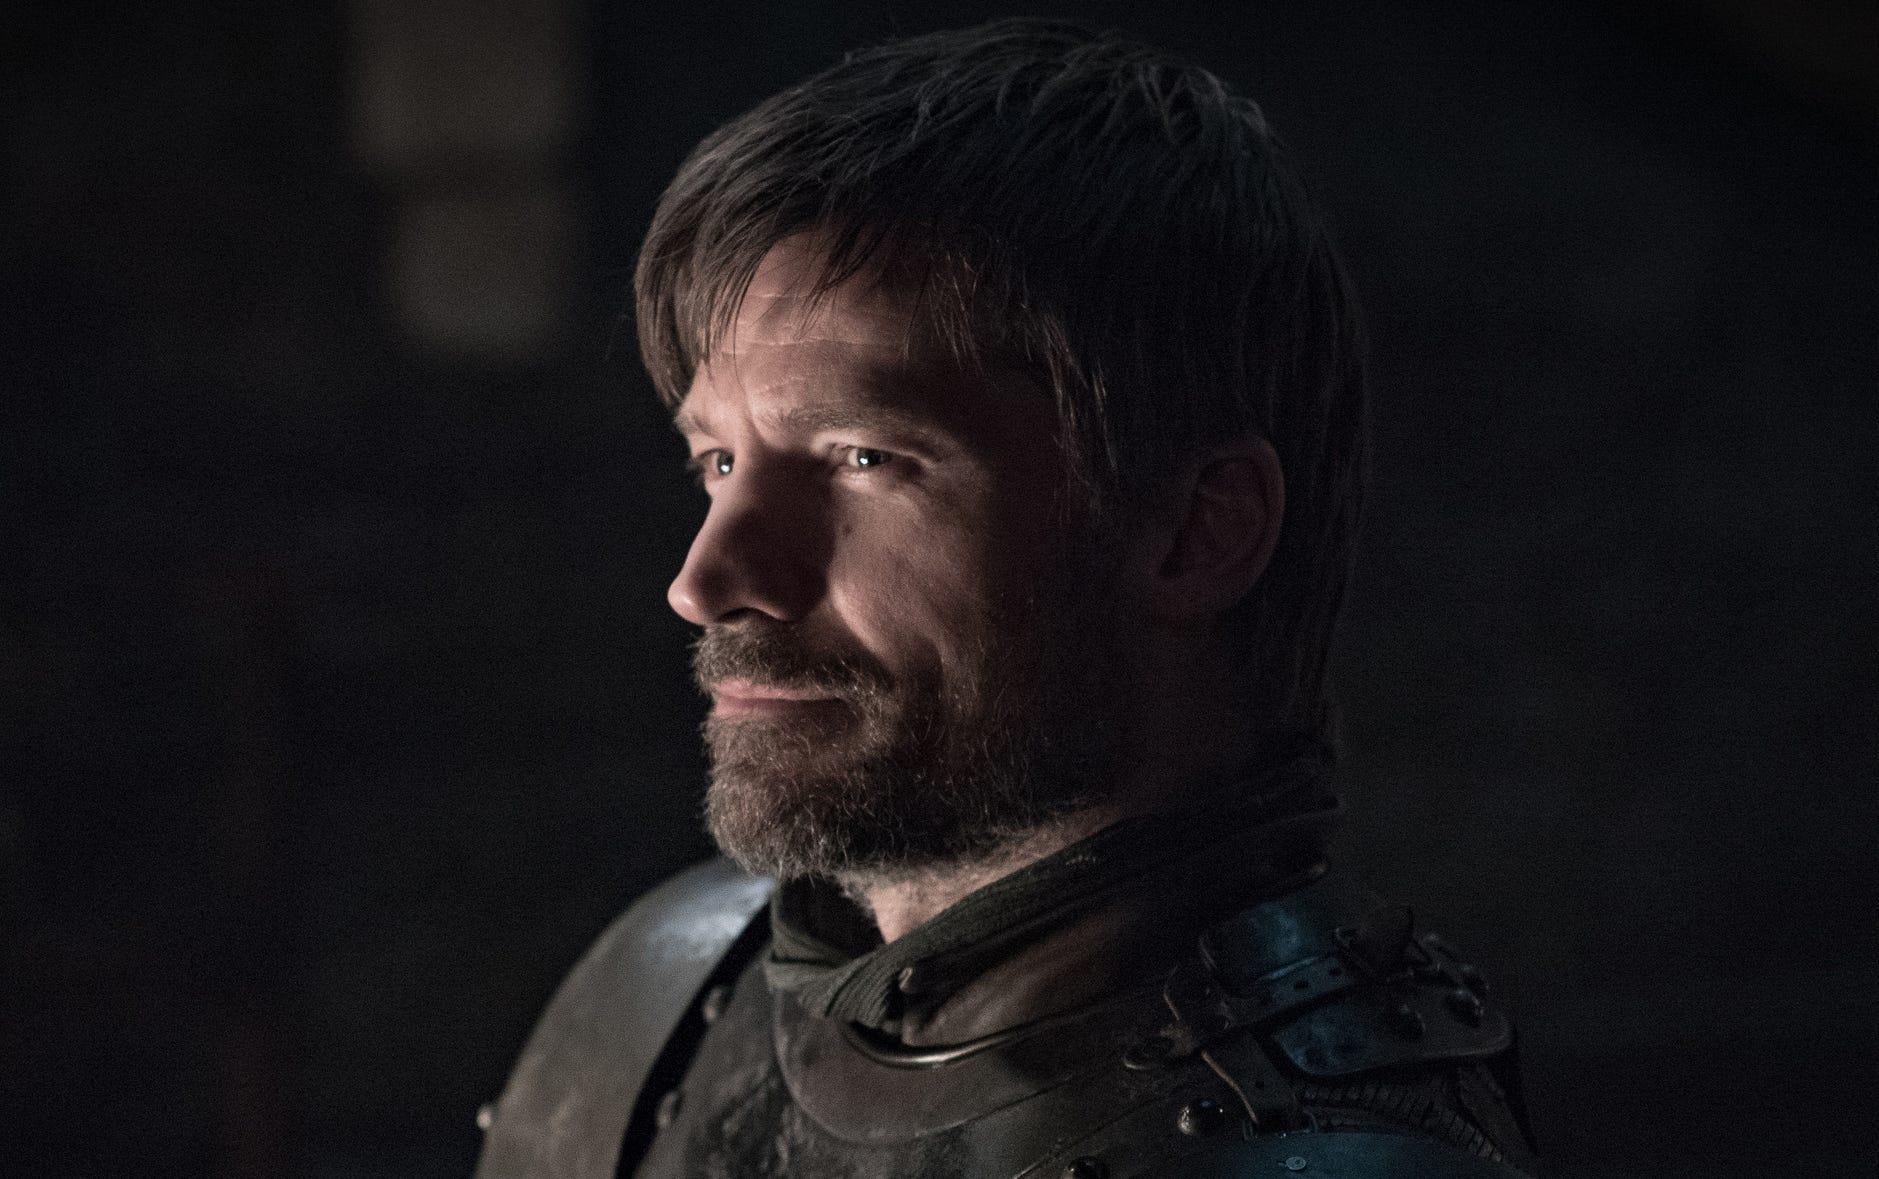 Nikolaj Coster-Waldau as Jaime Lannister on